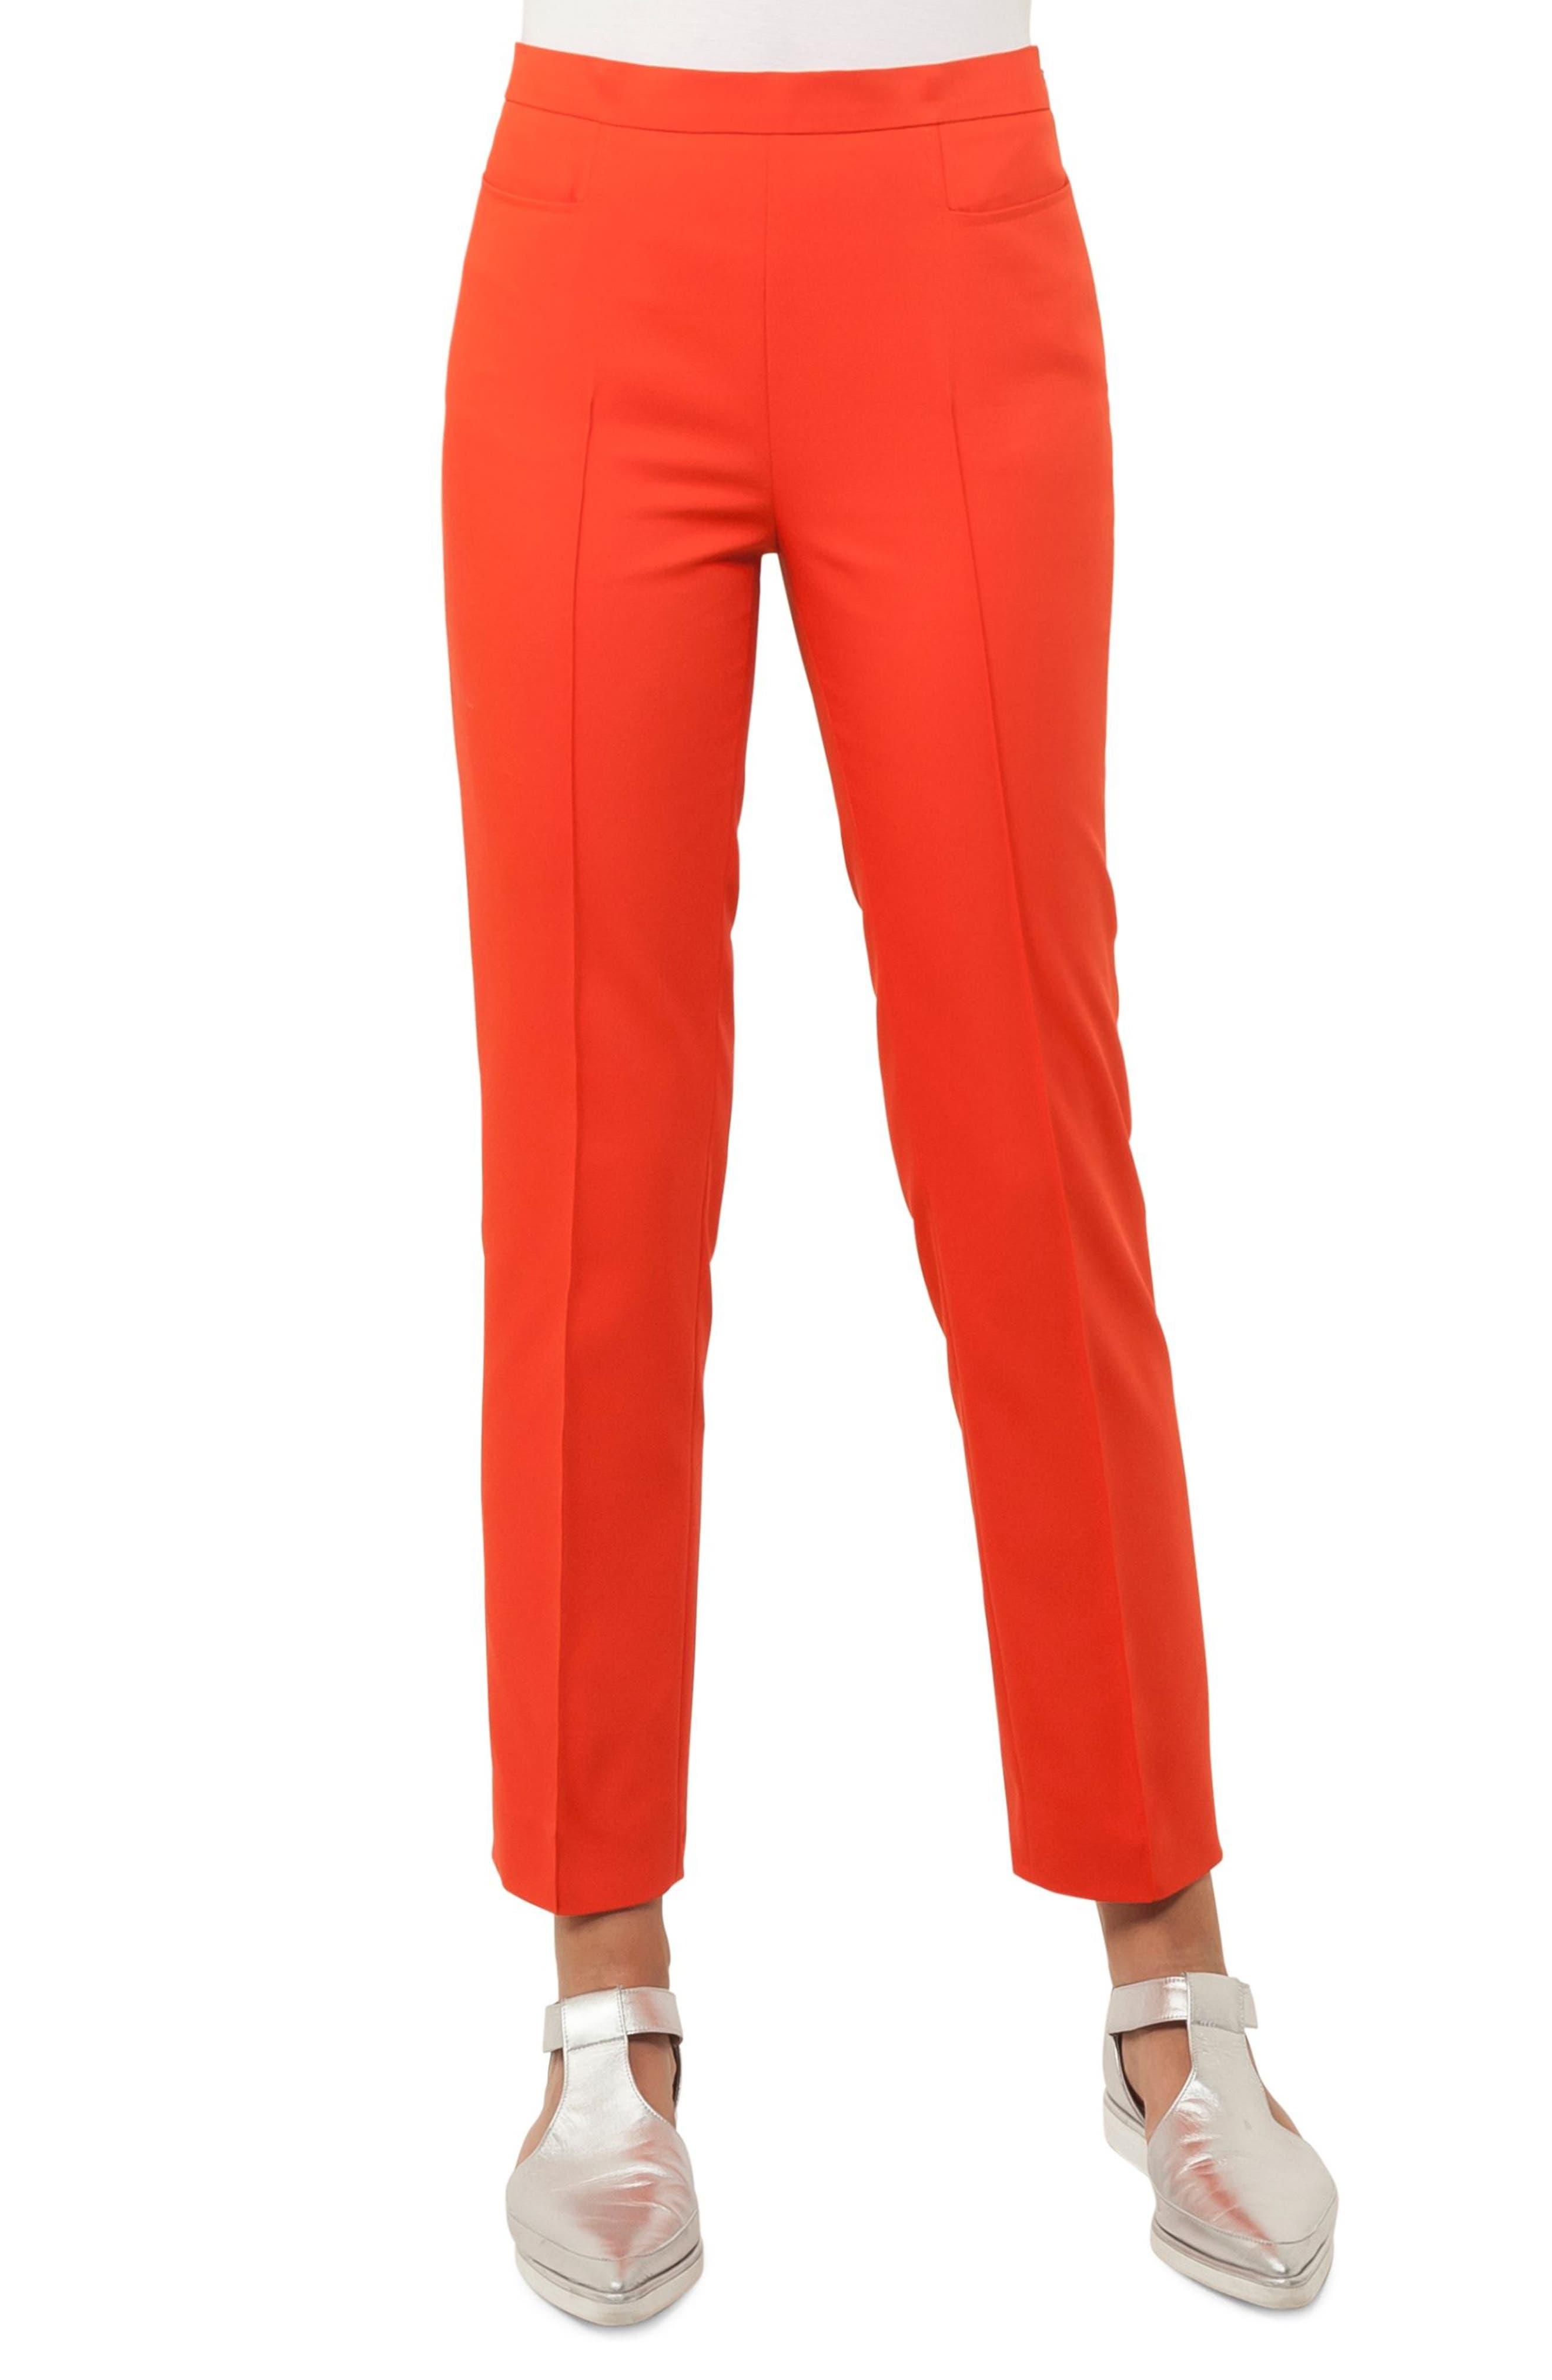 Franca Stretch Cotton Pants,                         Main,                         color, Papaya